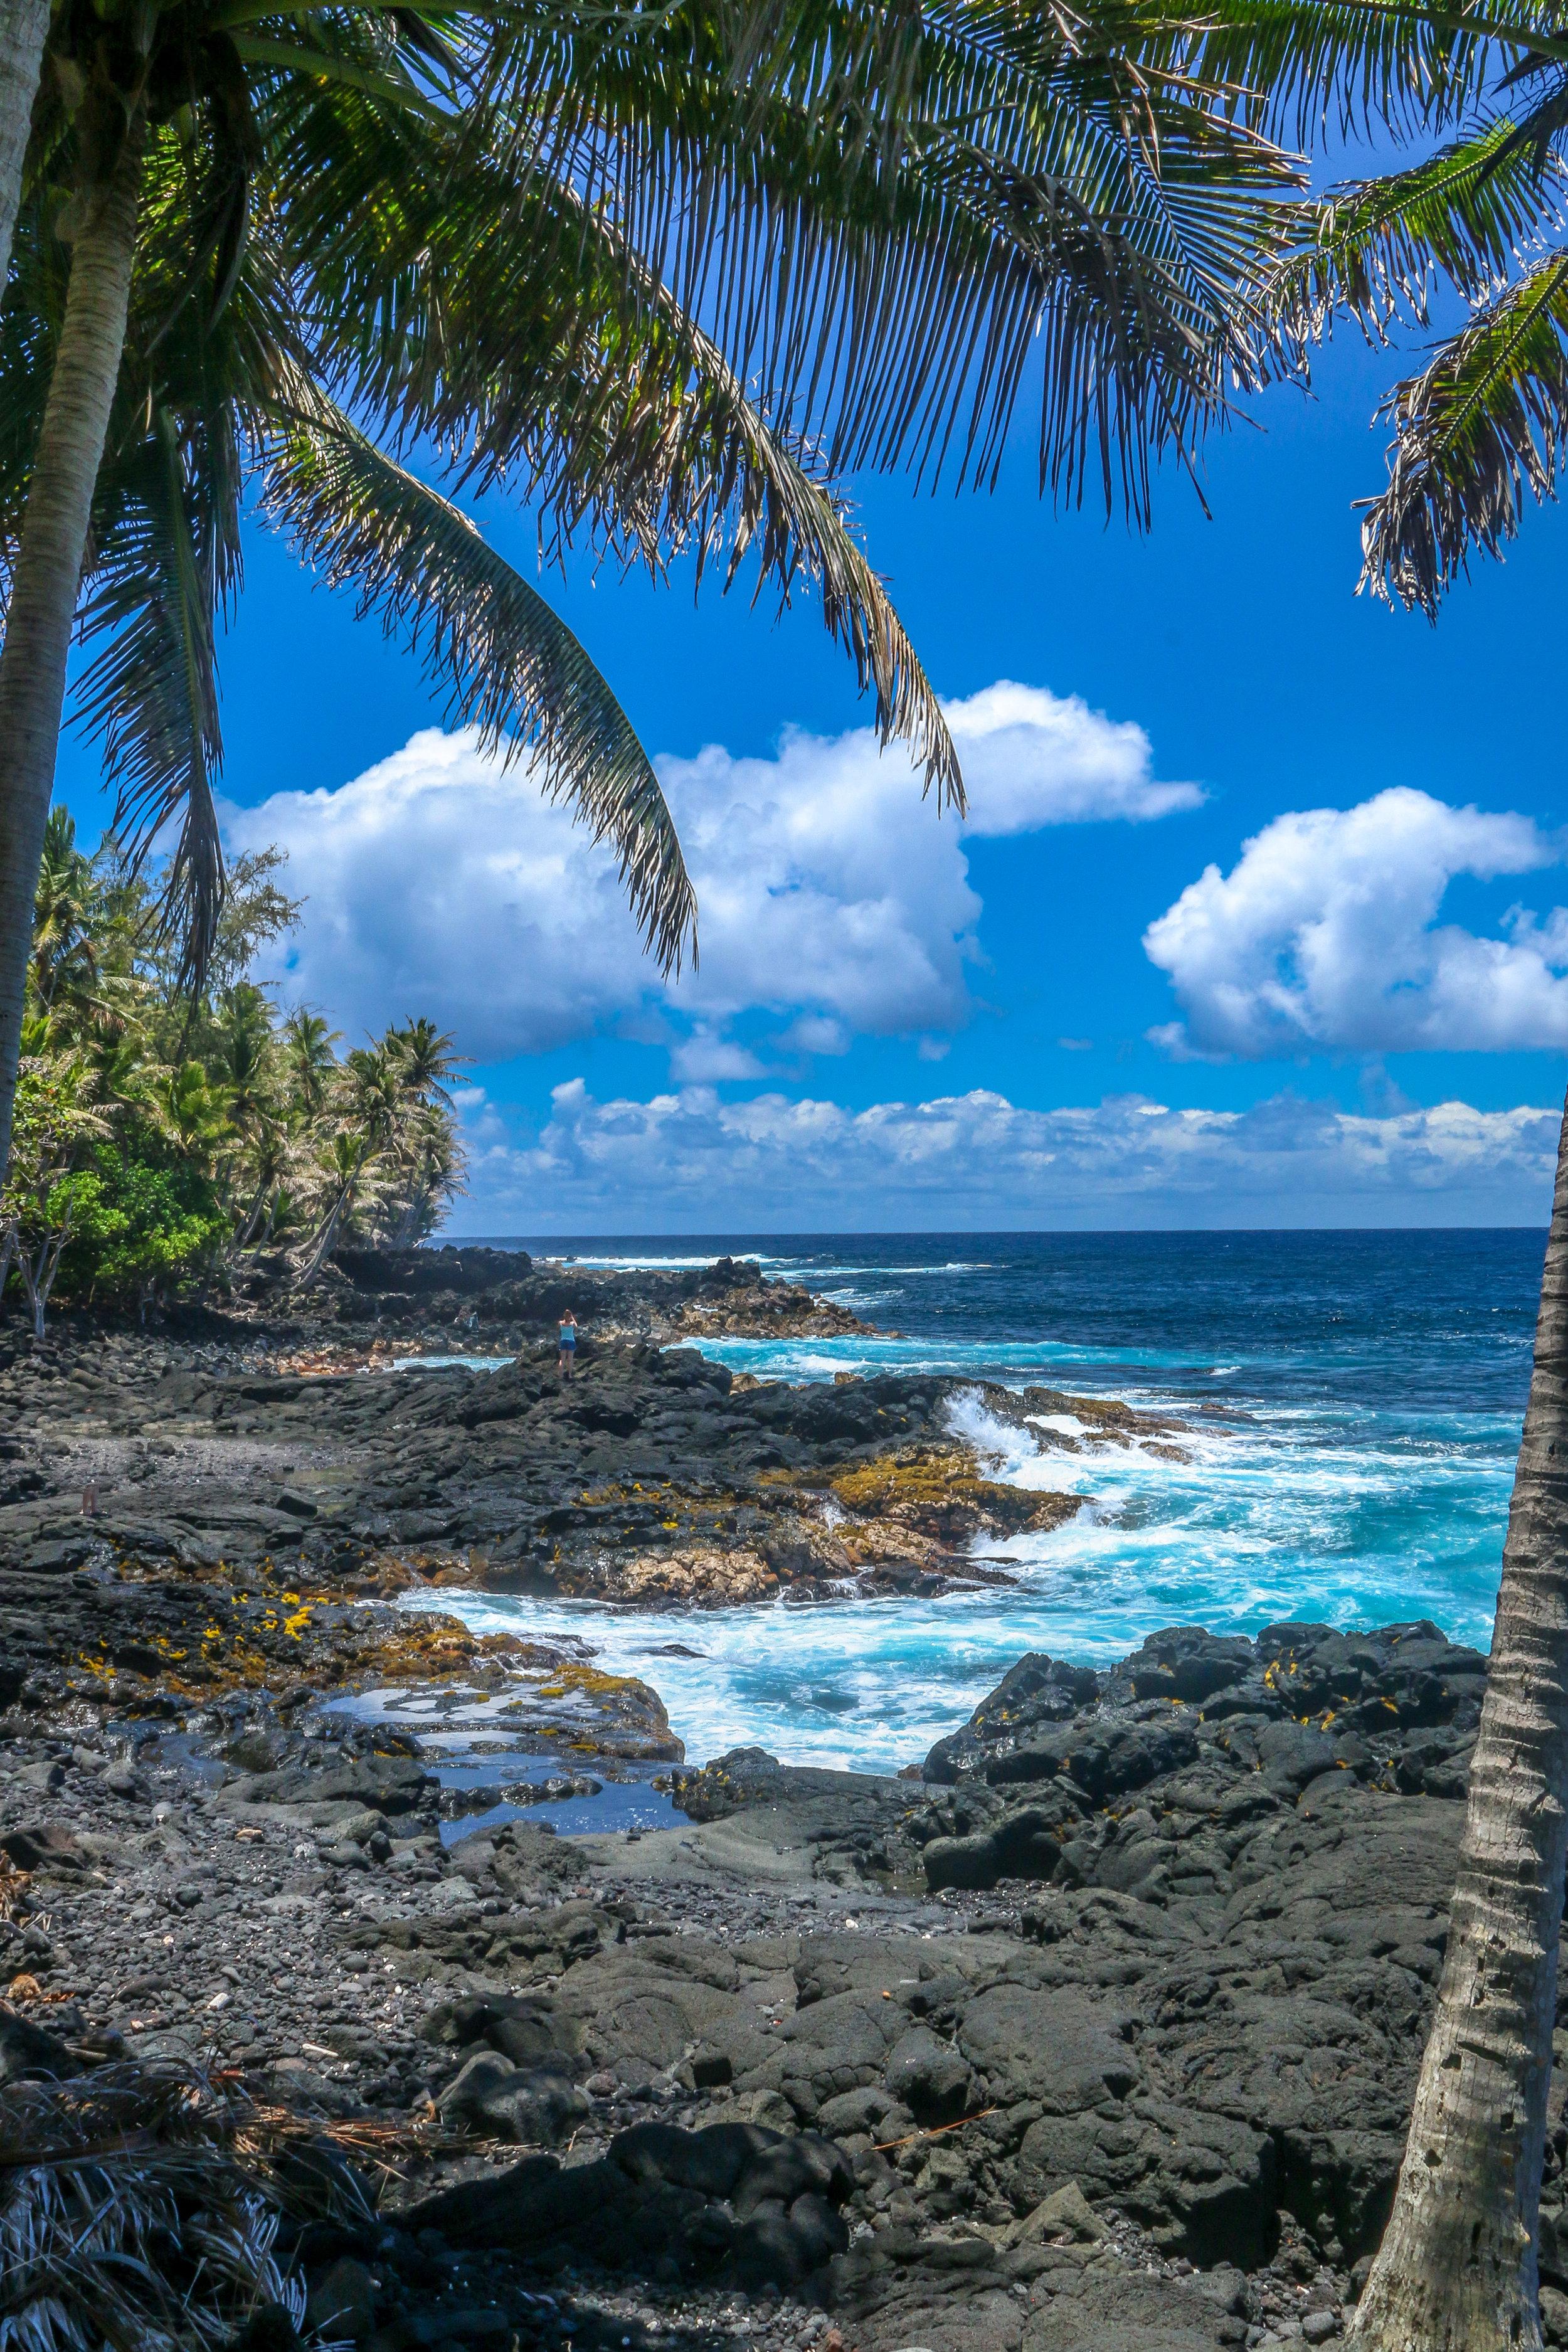 Hawaii HI Big Island Photos Photography ocean view palm trees